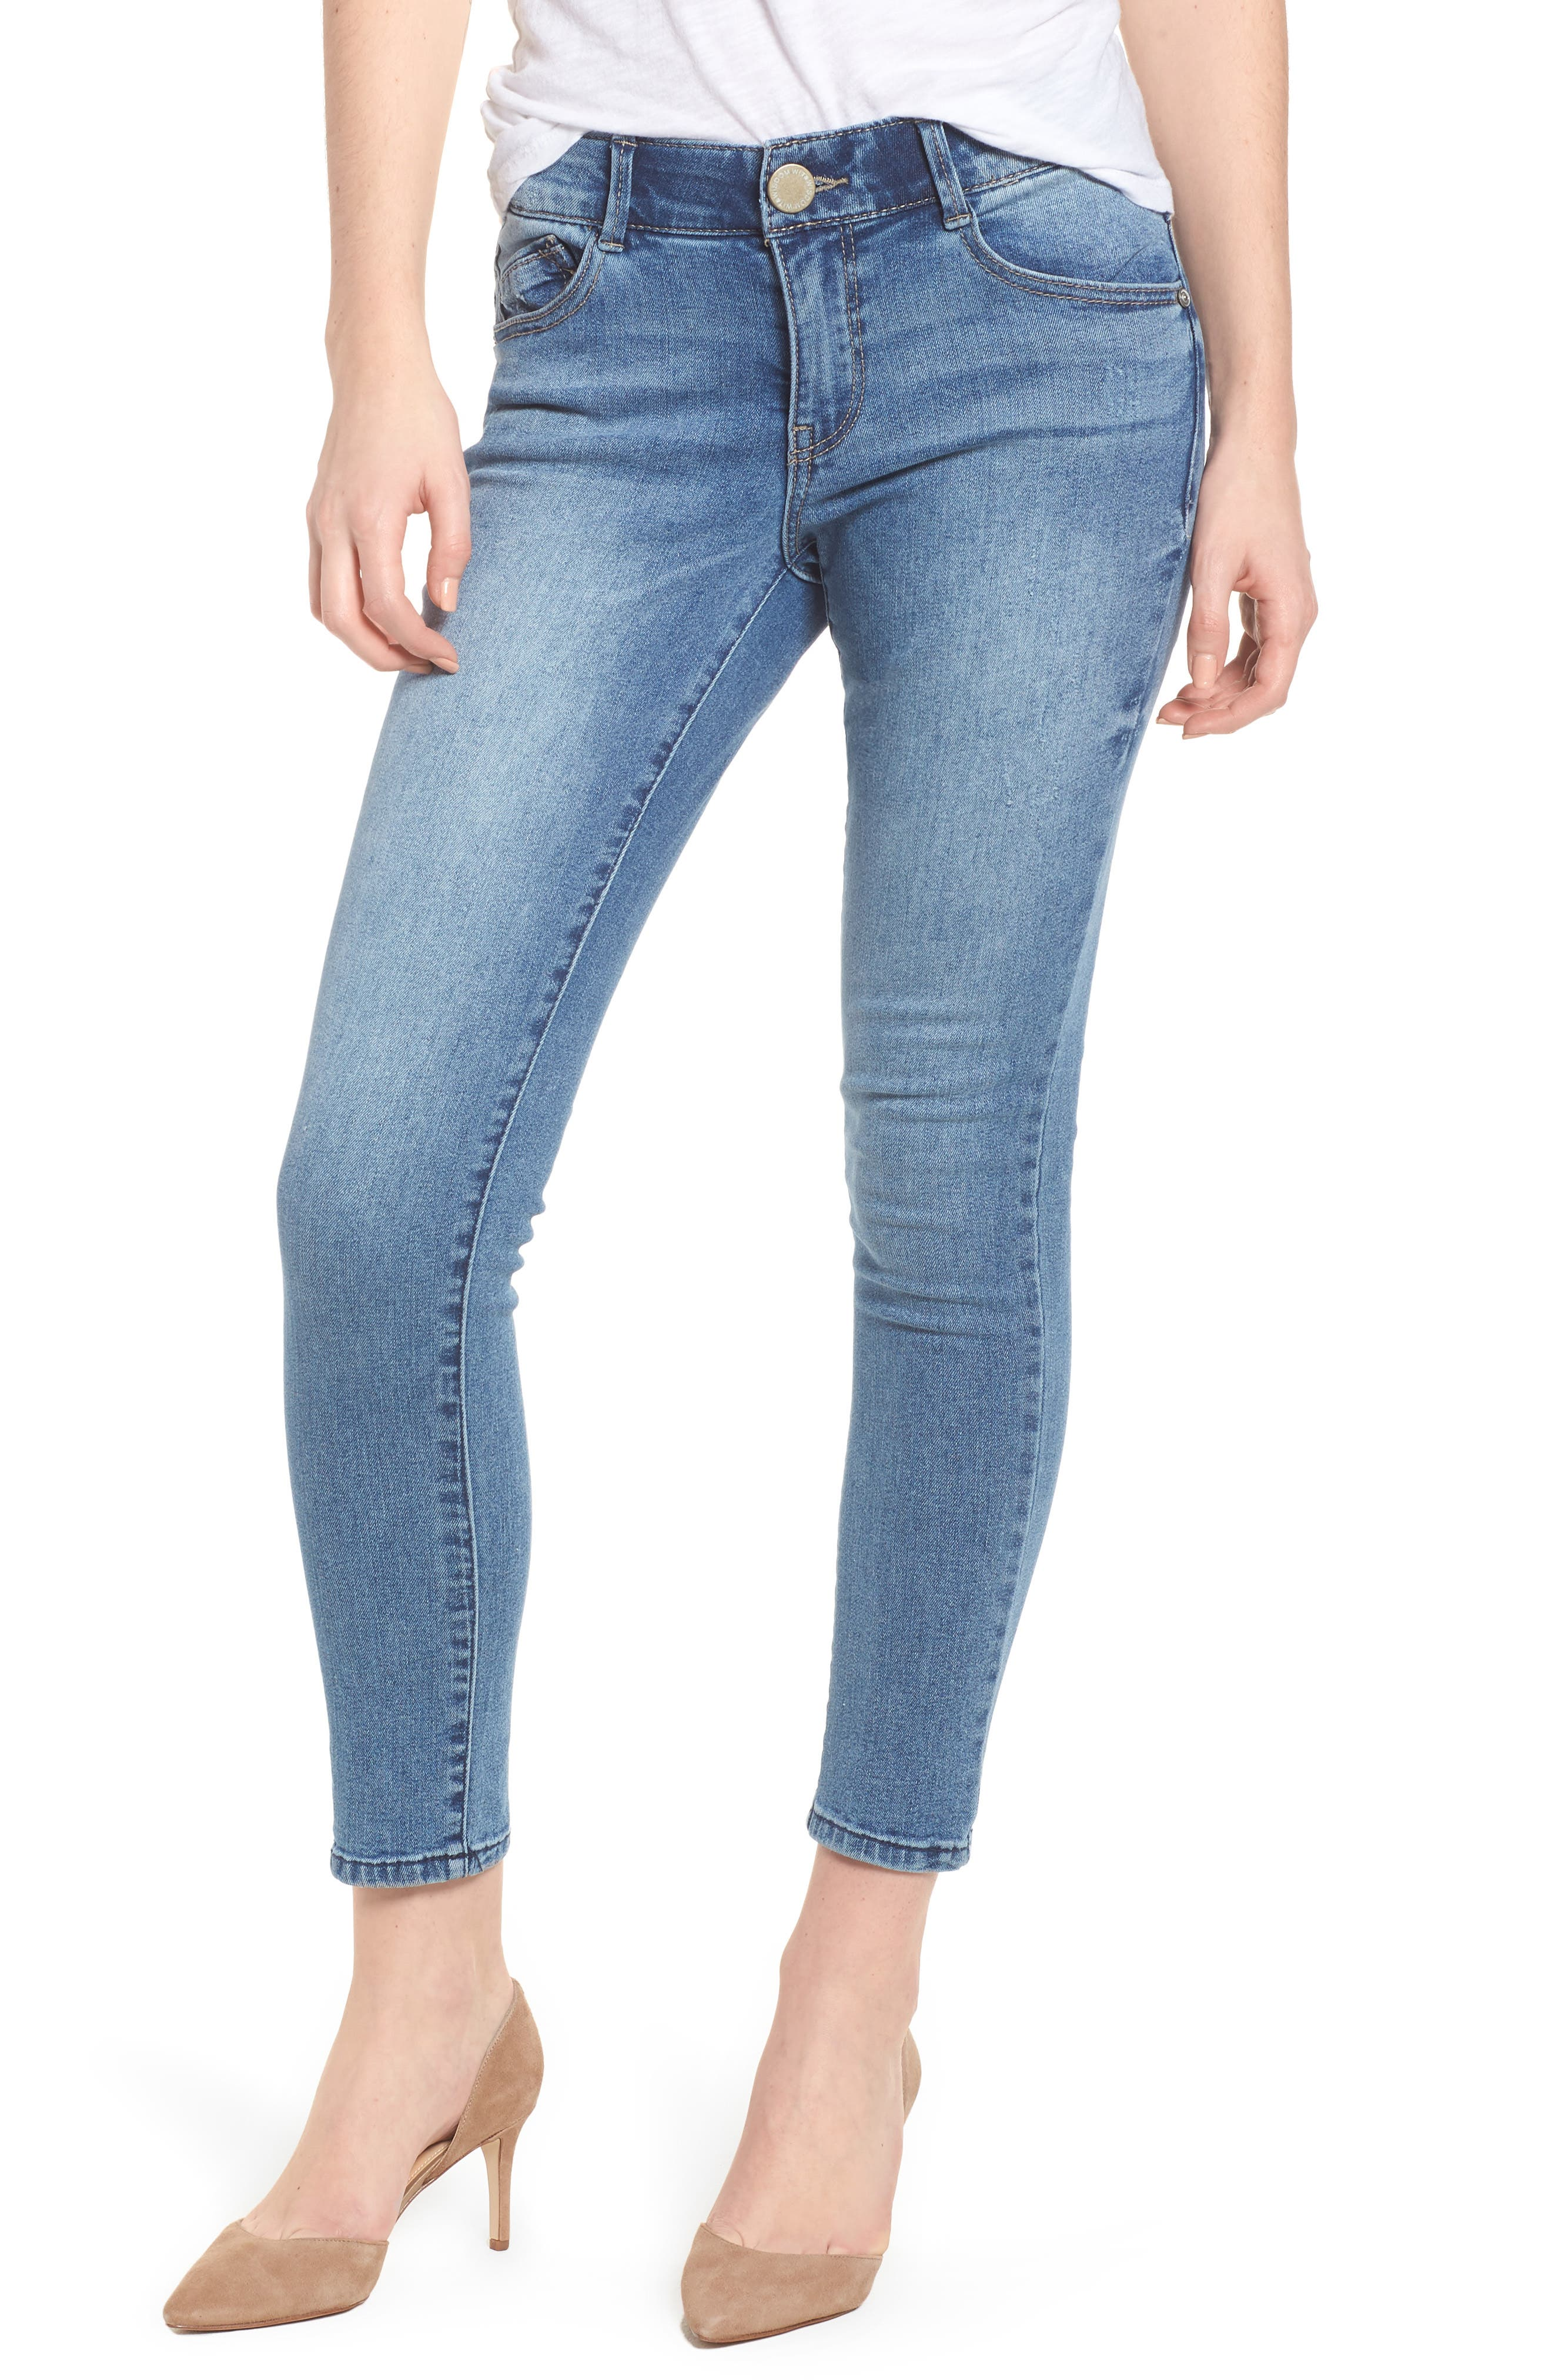 Ab-solution Ankle Skimmer Skinny Jeans Regular & Petite,                         Main,                         color, 458